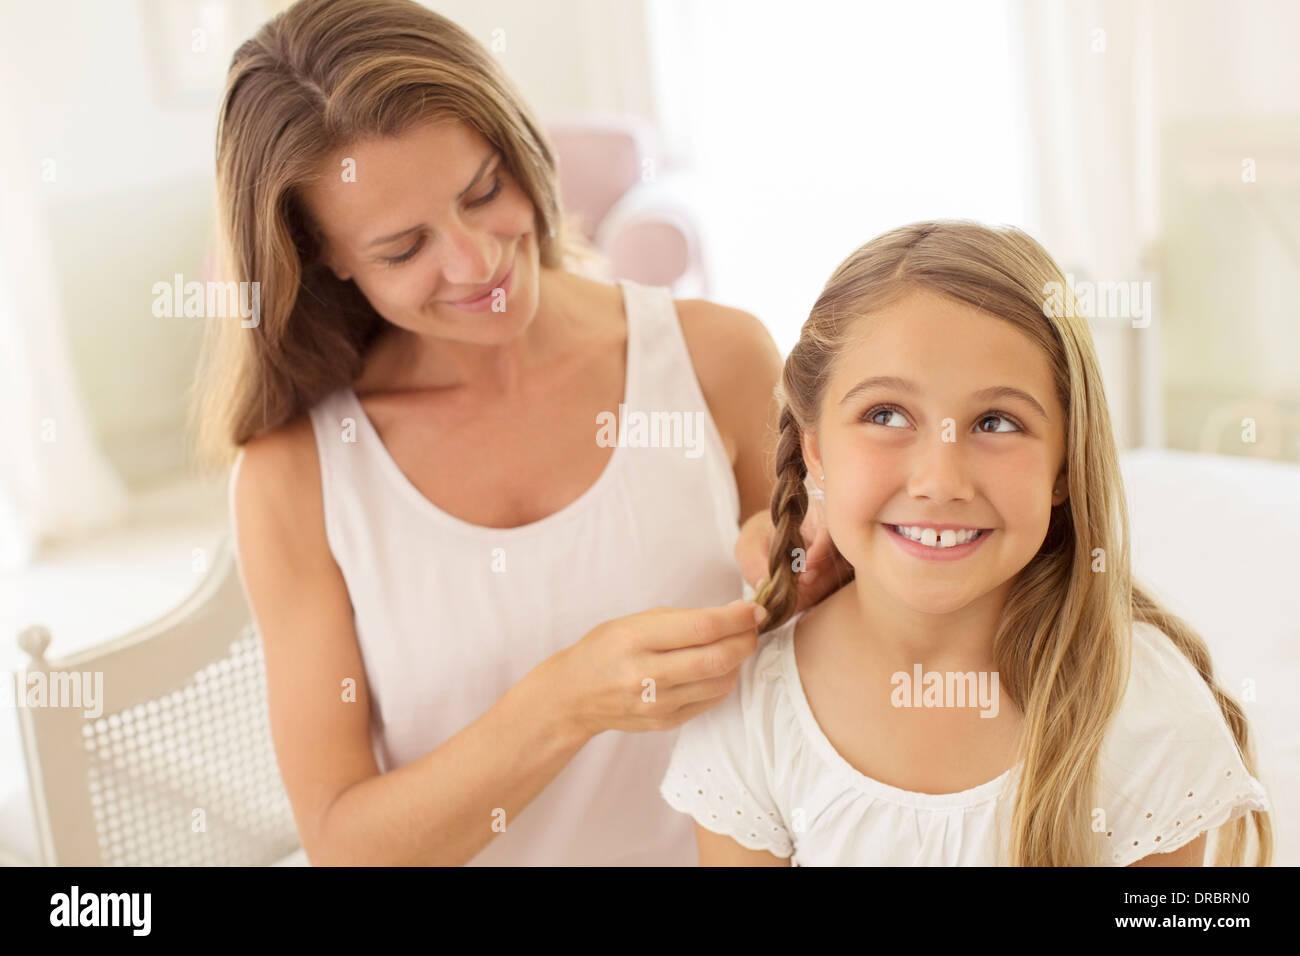 Mother braiding daughter's hair - Stock Image